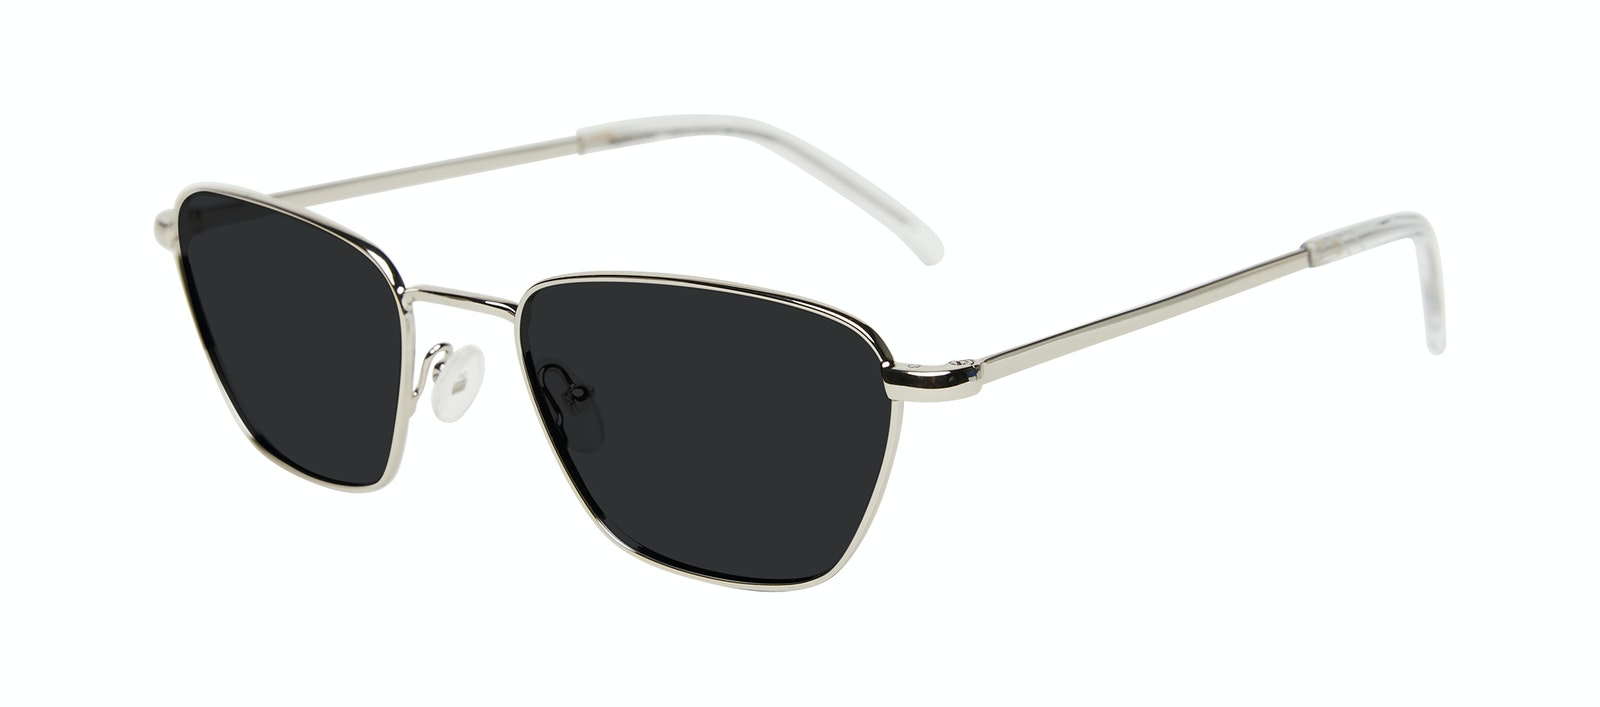 Affordable Fashion Glasses Square Sunglasses Women Venice Silver Tilt